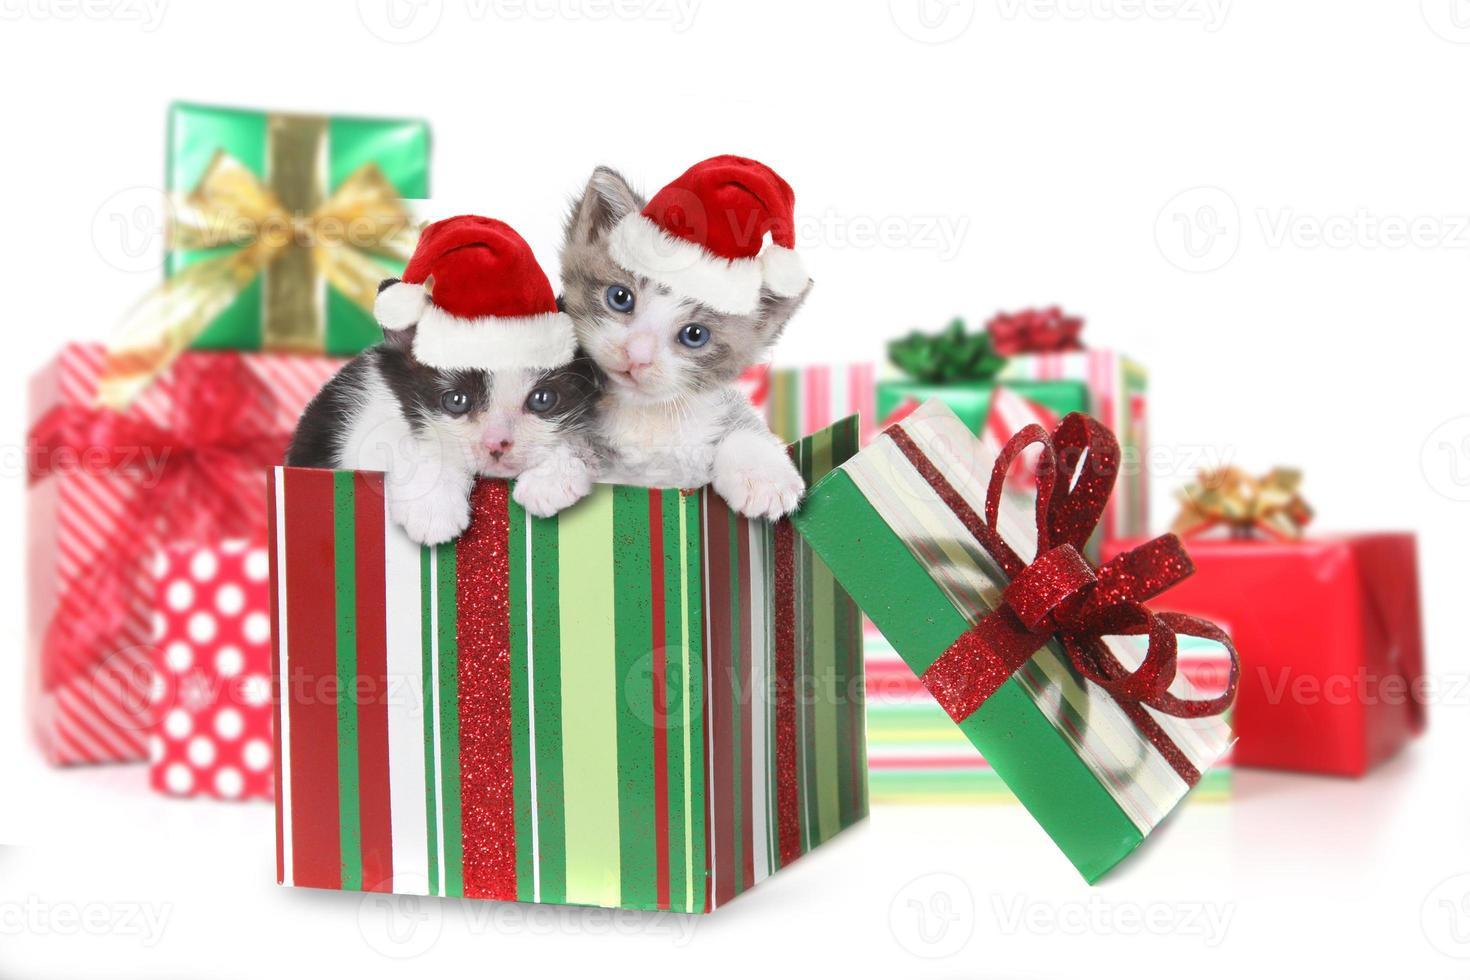 doos kittens als kerstcadeau foto